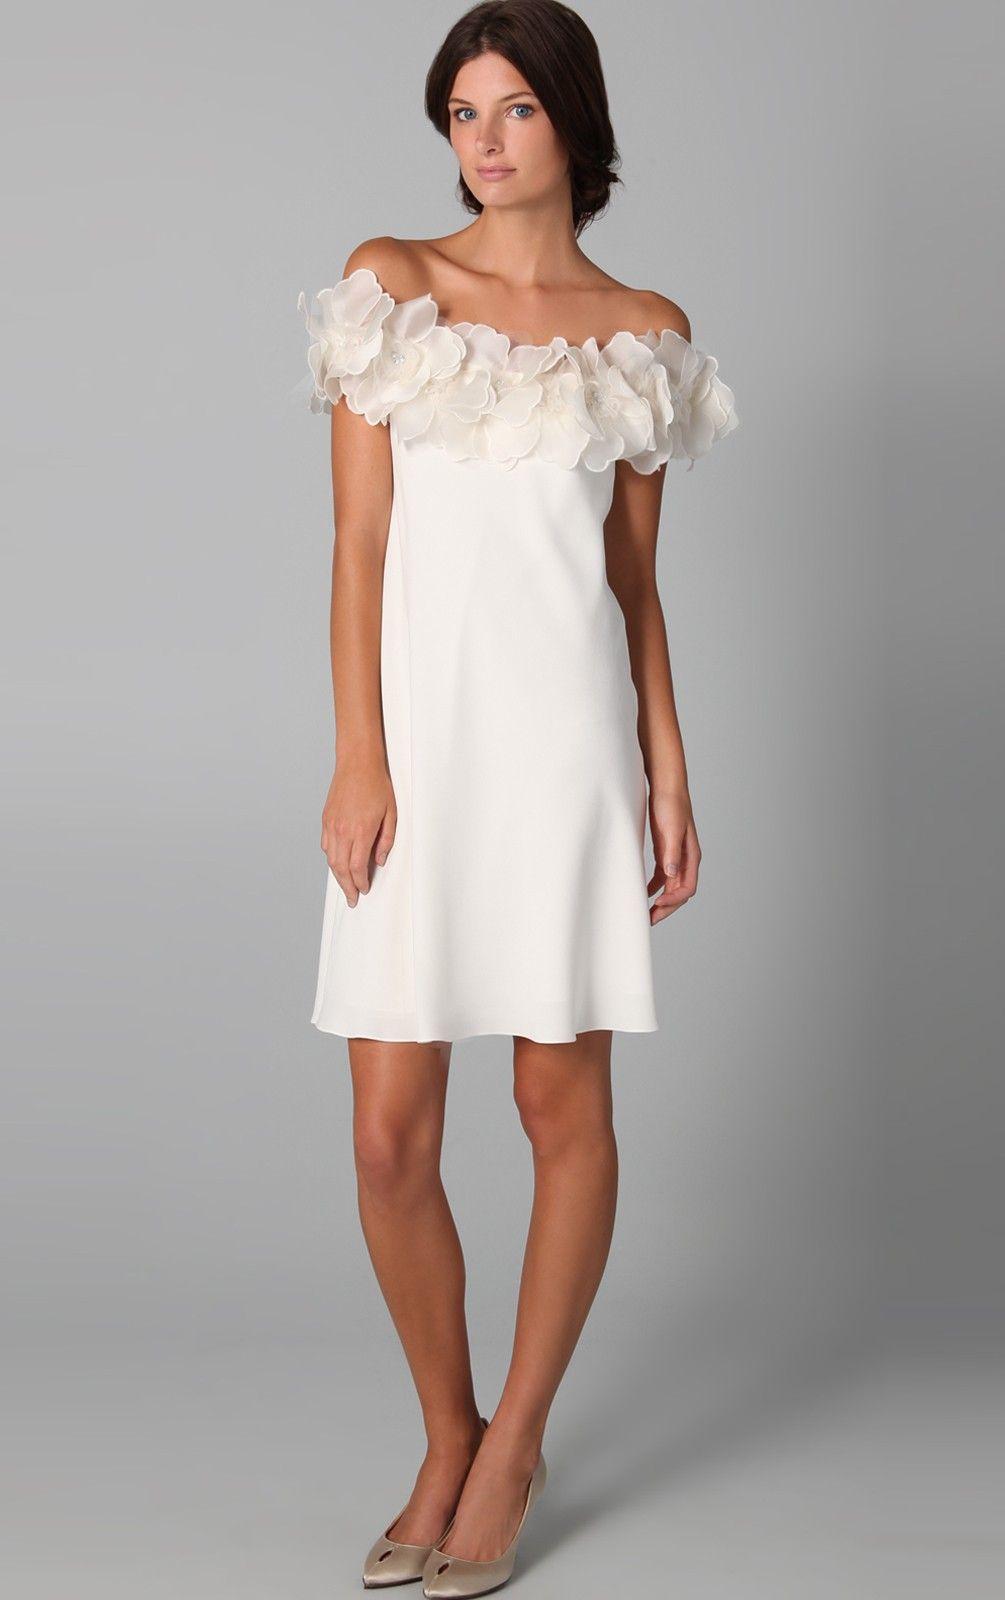 Amazing Aline Short Off The Shoulder White Chiffon Dress